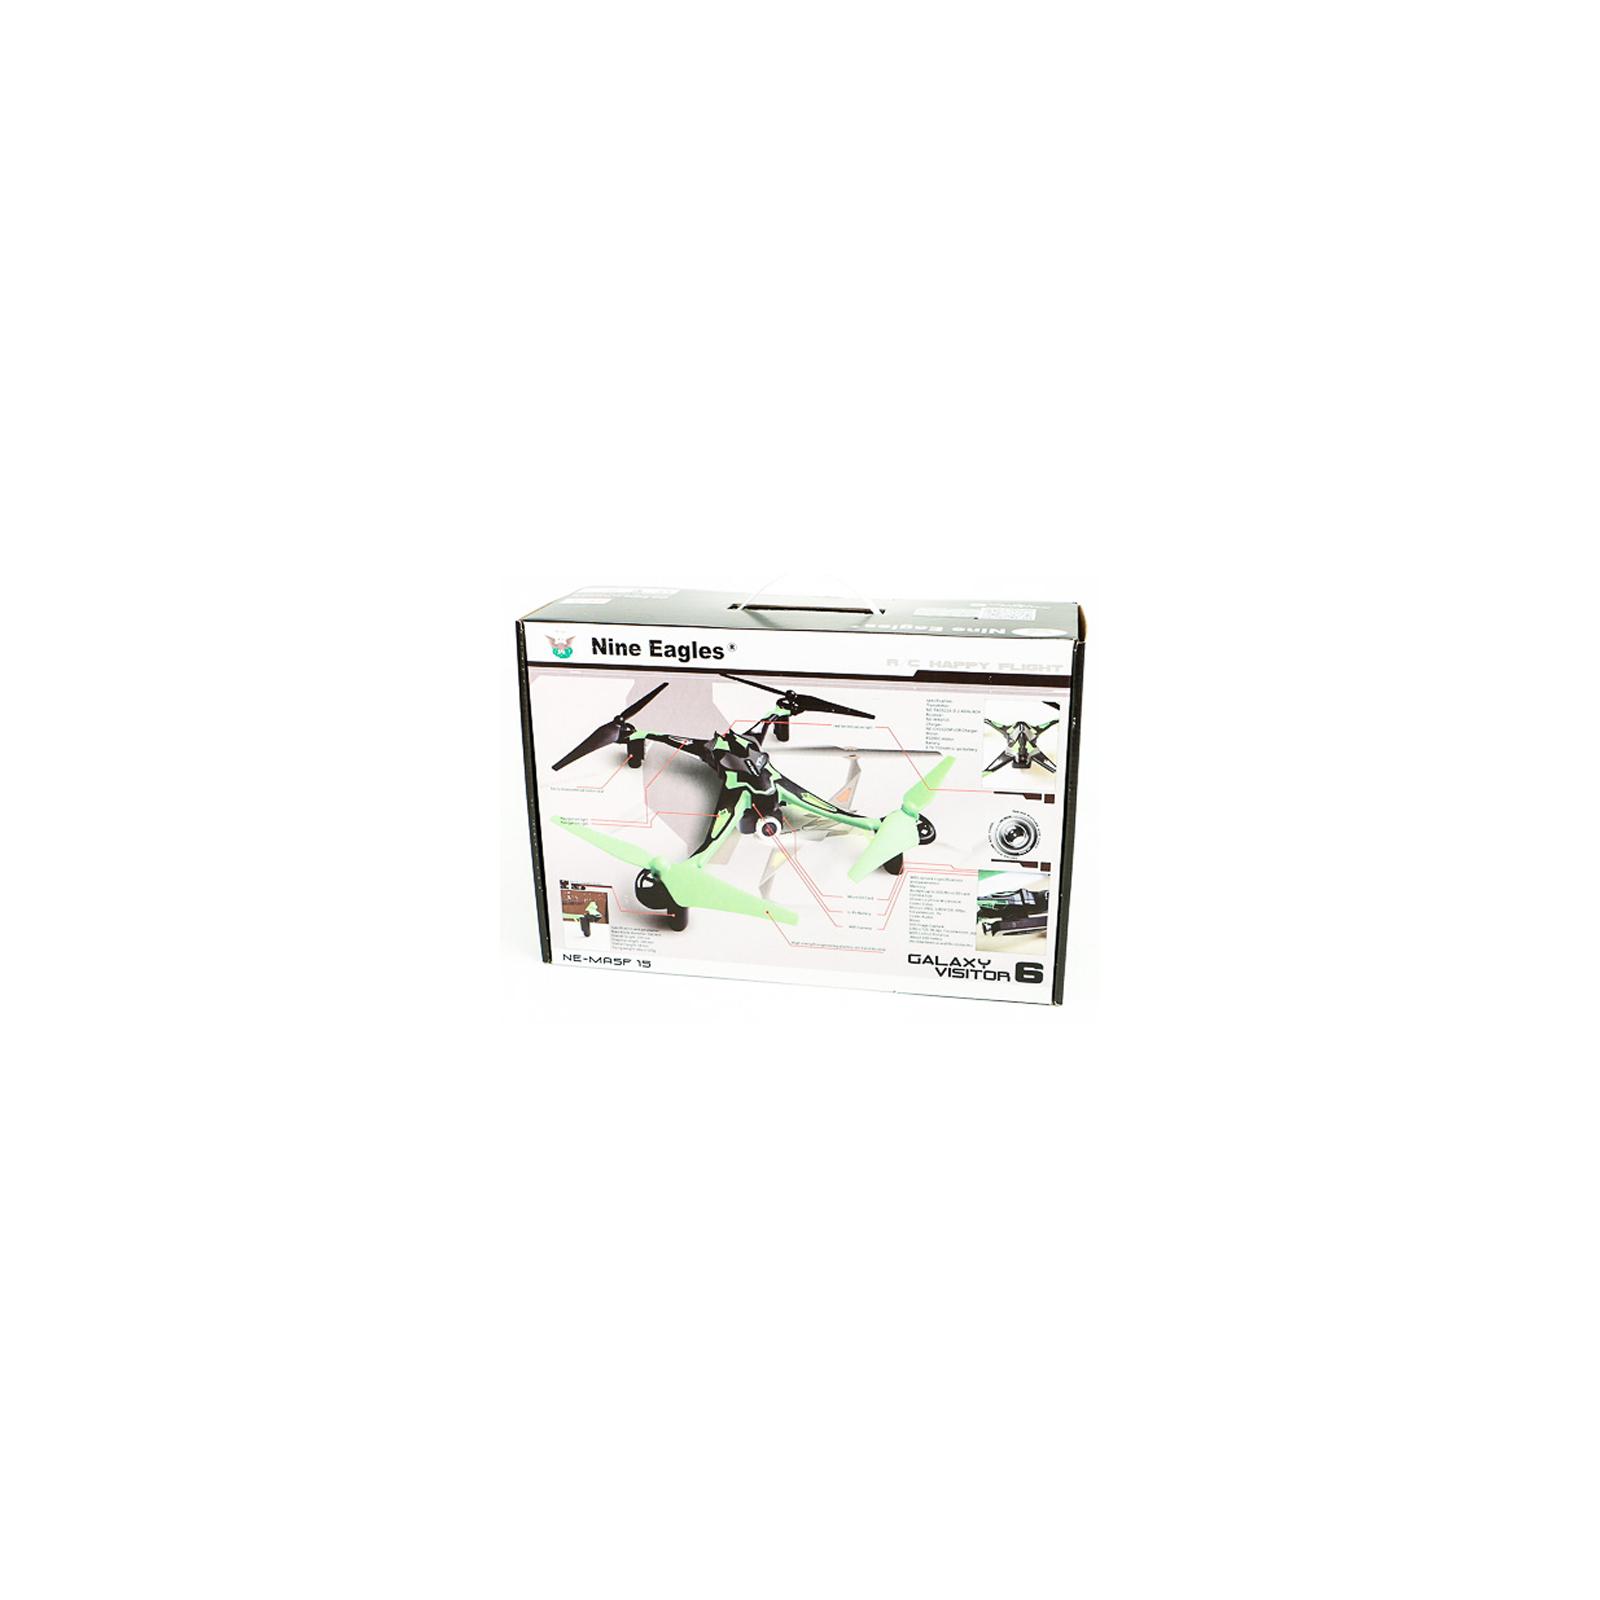 Квадрокоптер Nine Eagles Galaxy Visitor 6 FPV 4CH с Wi-Fi камерой зеленый (NE201890) изображение 6